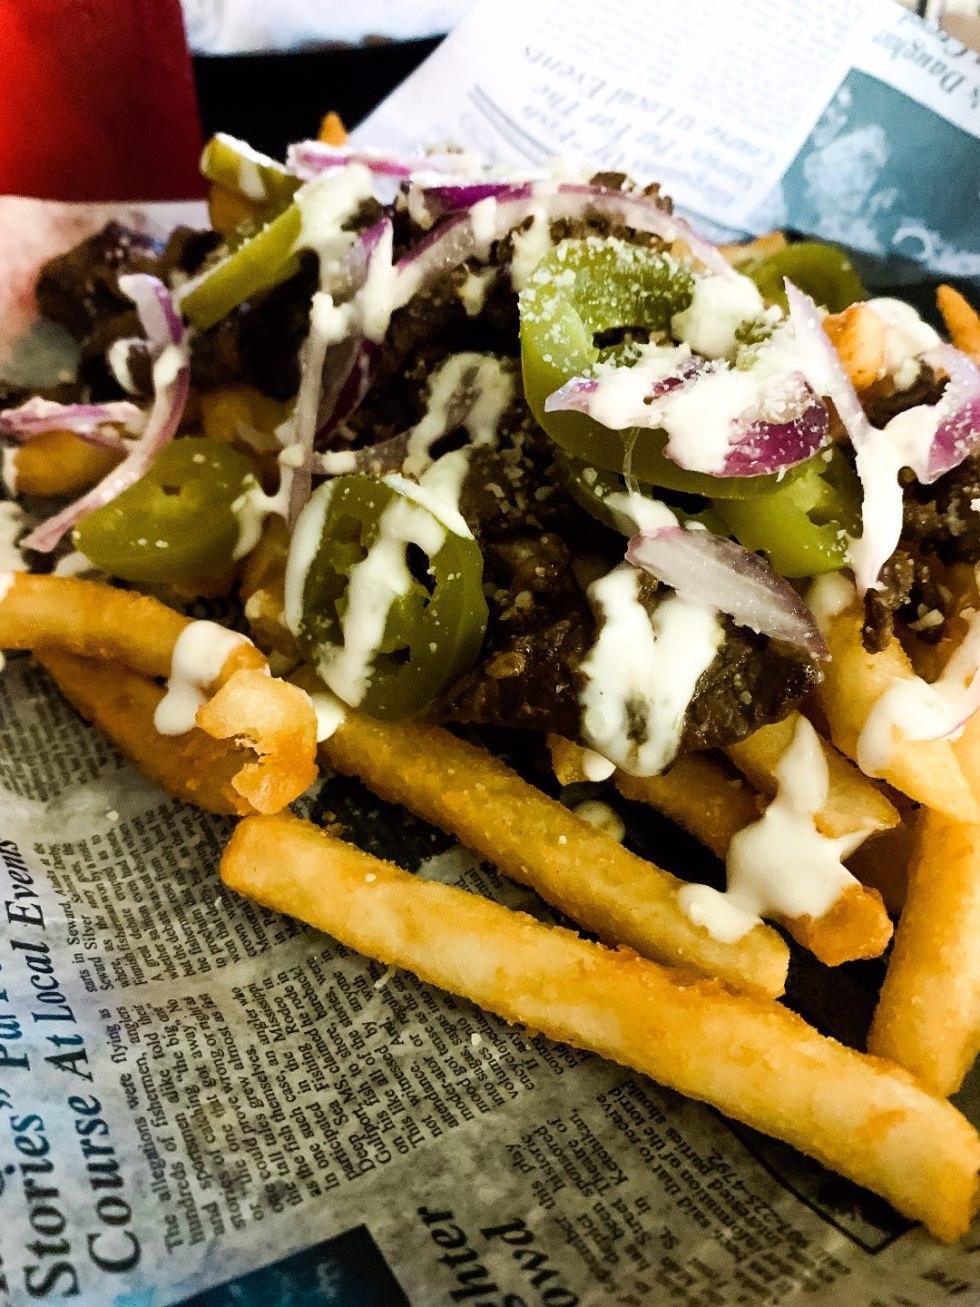 Eastern North Carolina Travel Guide: Top 10 Things to Do in Goldsboro NC by popular North Carolina blog, I'm Fixin' To: image of food at Jay's Sushi and Burger Bar.